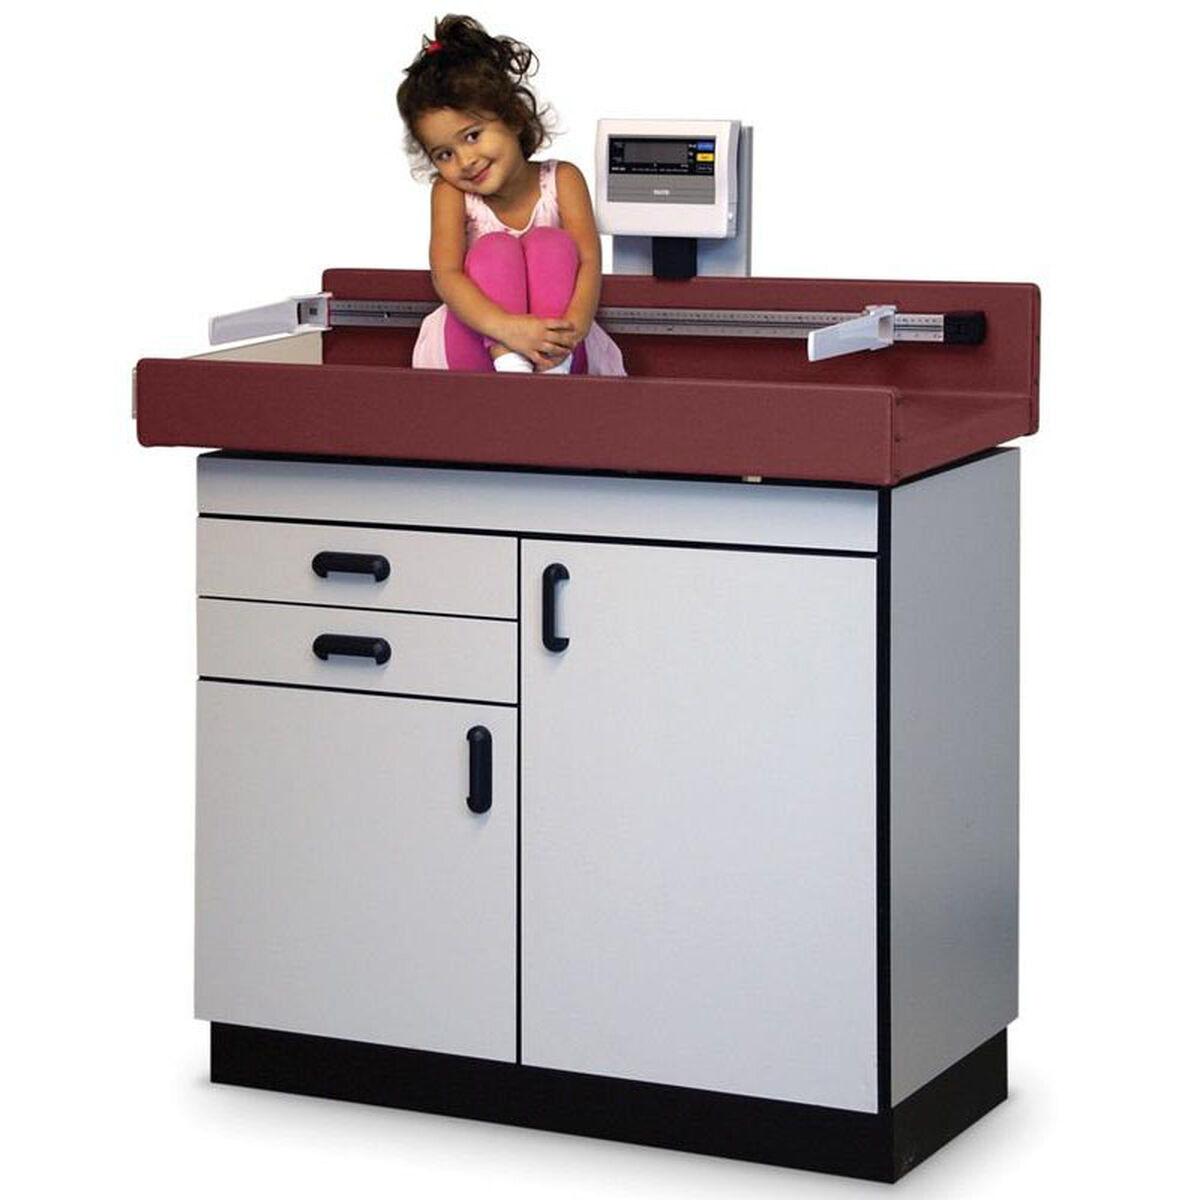 Pediatric Table With Scale Hau 4944 Bizchair Com